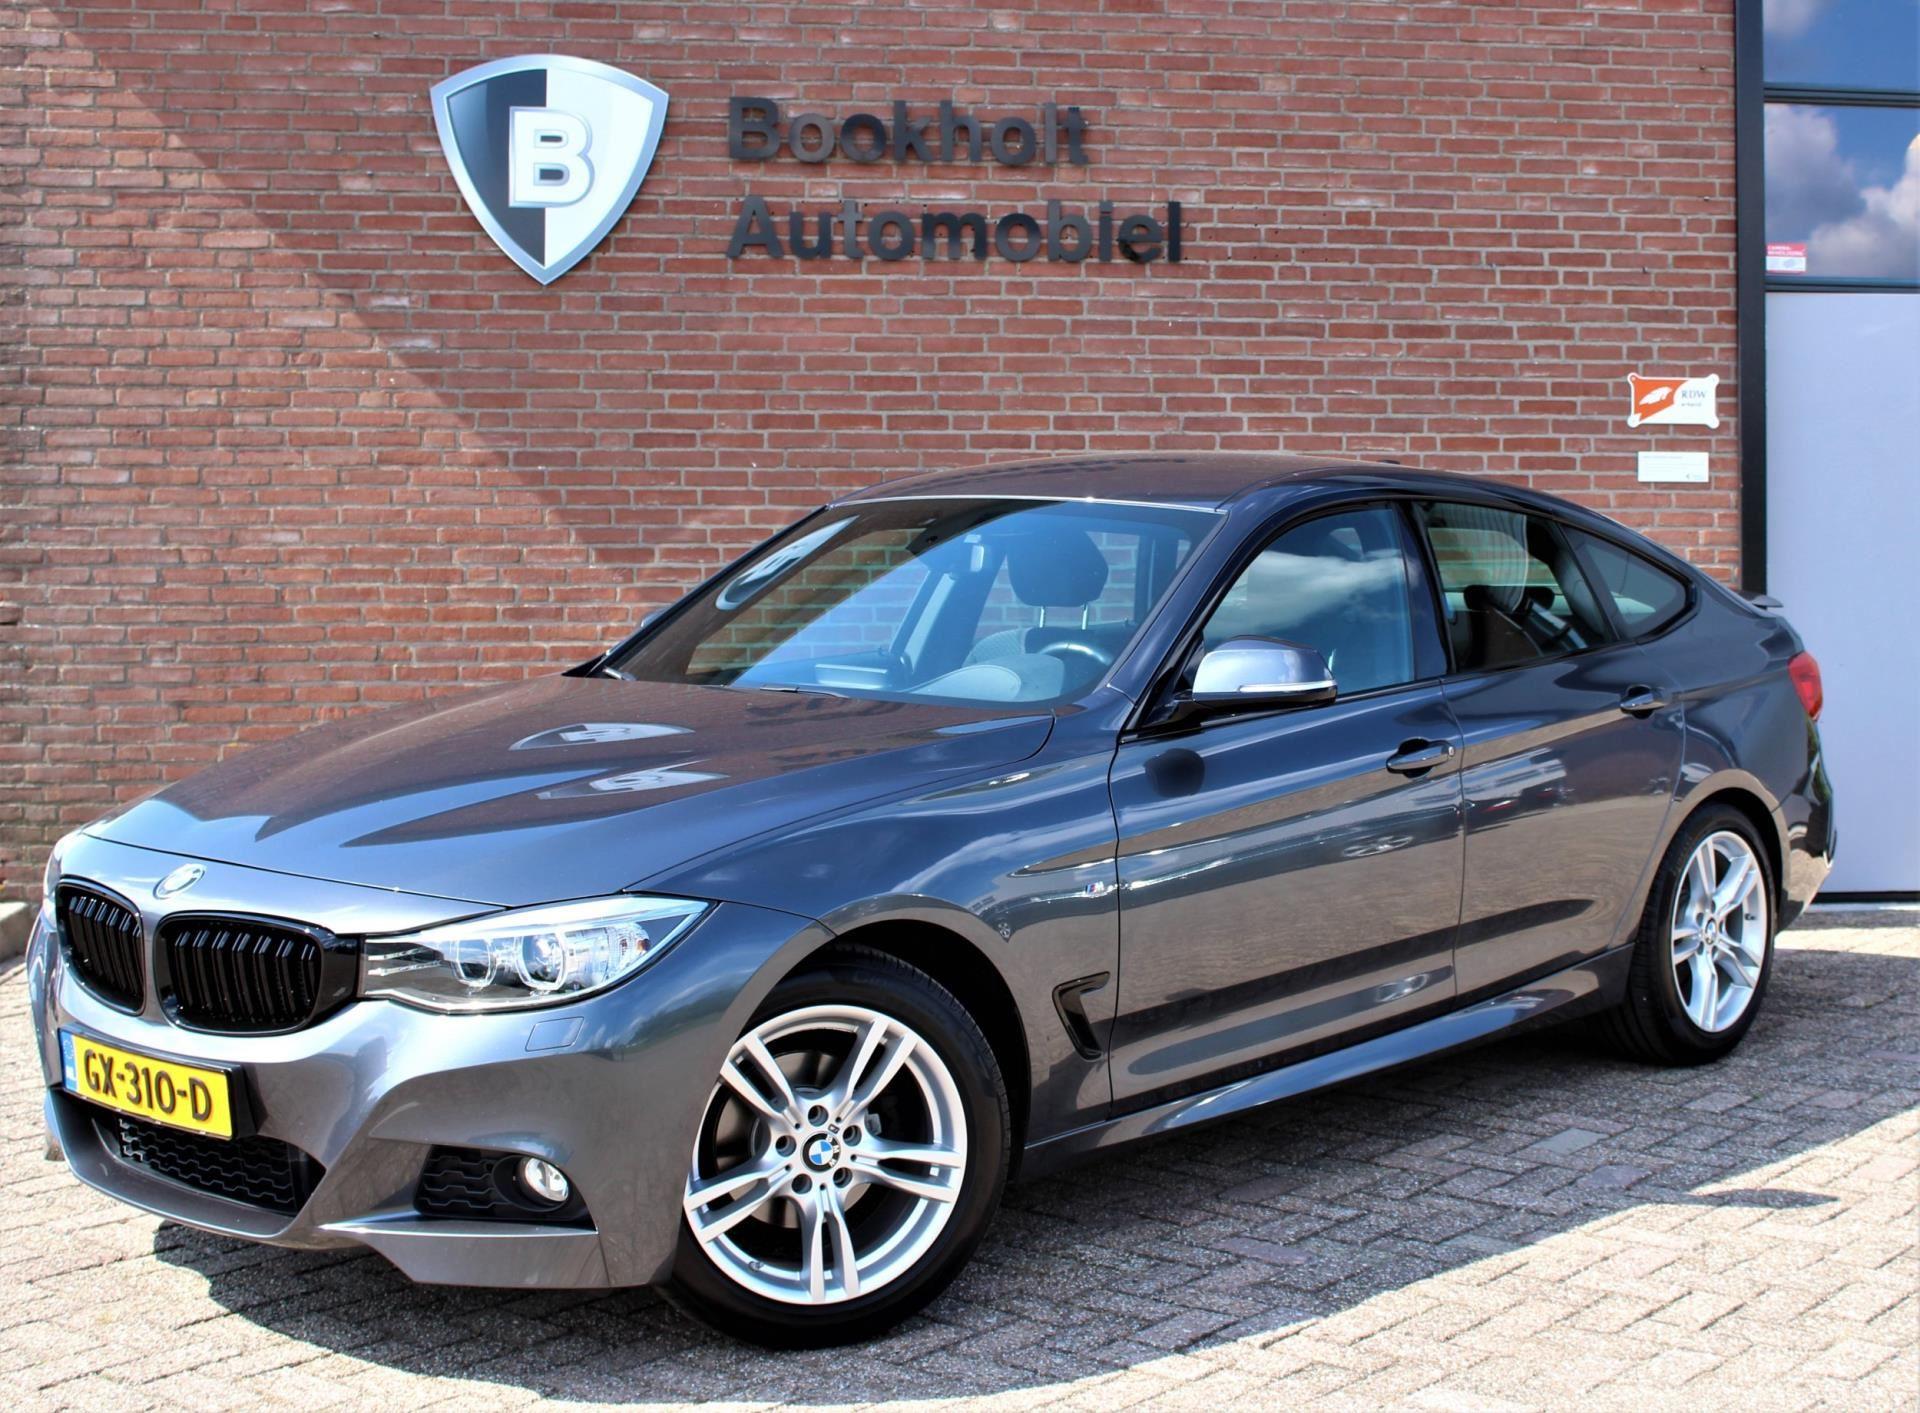 BMW 3-serie Gran Turismo occasion - Bookholt Automobiel